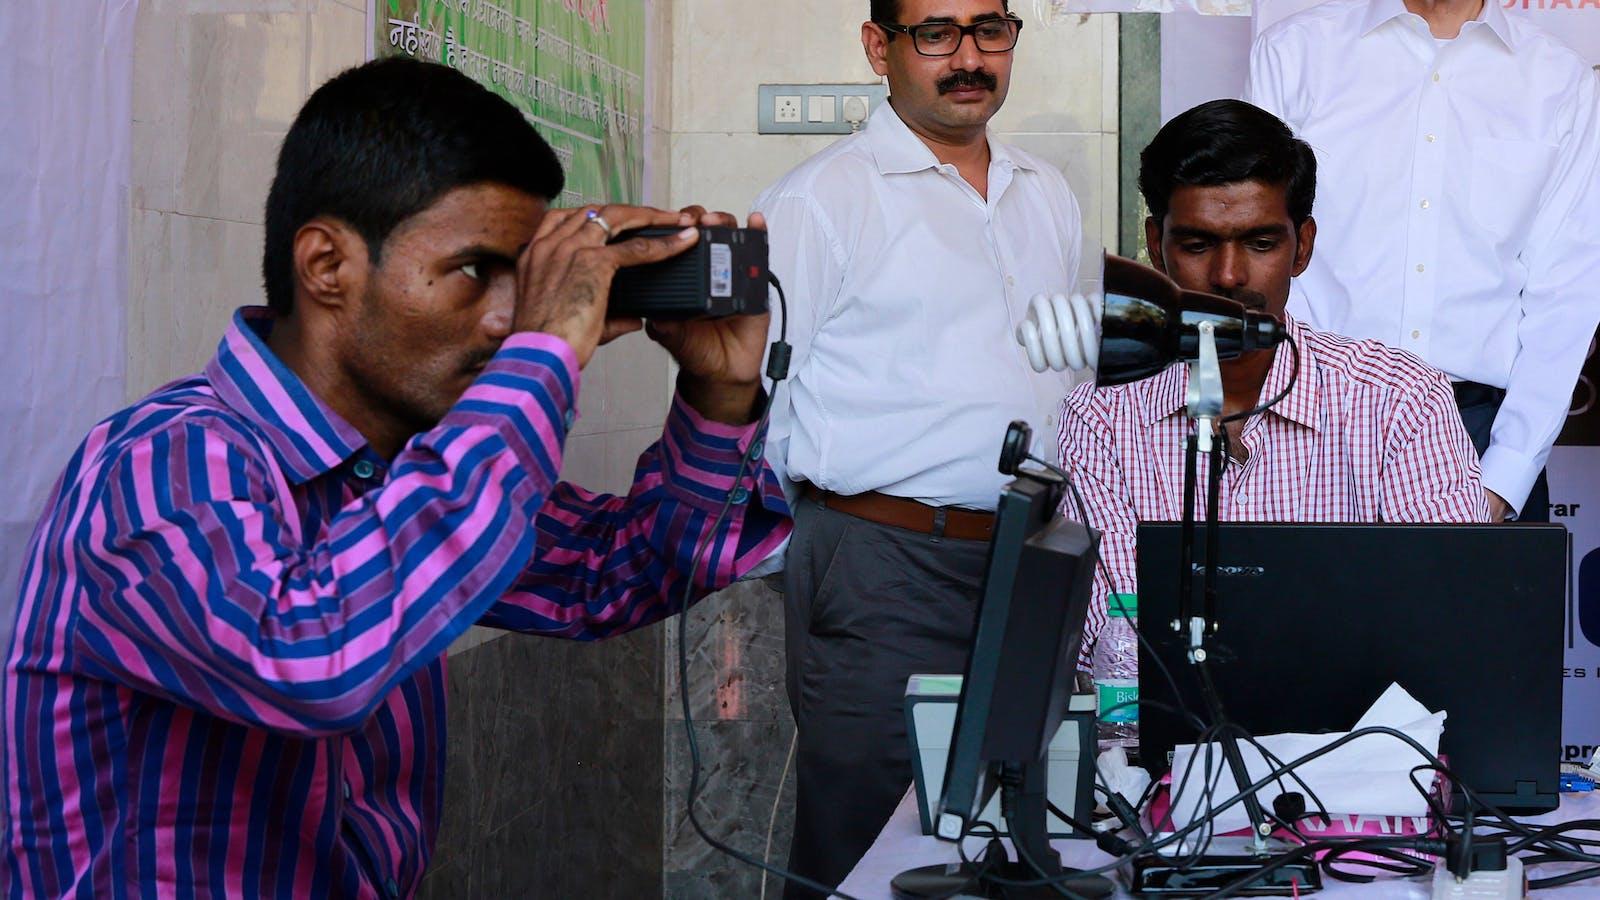 An enrollment camp for Aadhaar in Mumbai, India. Photo by AP.